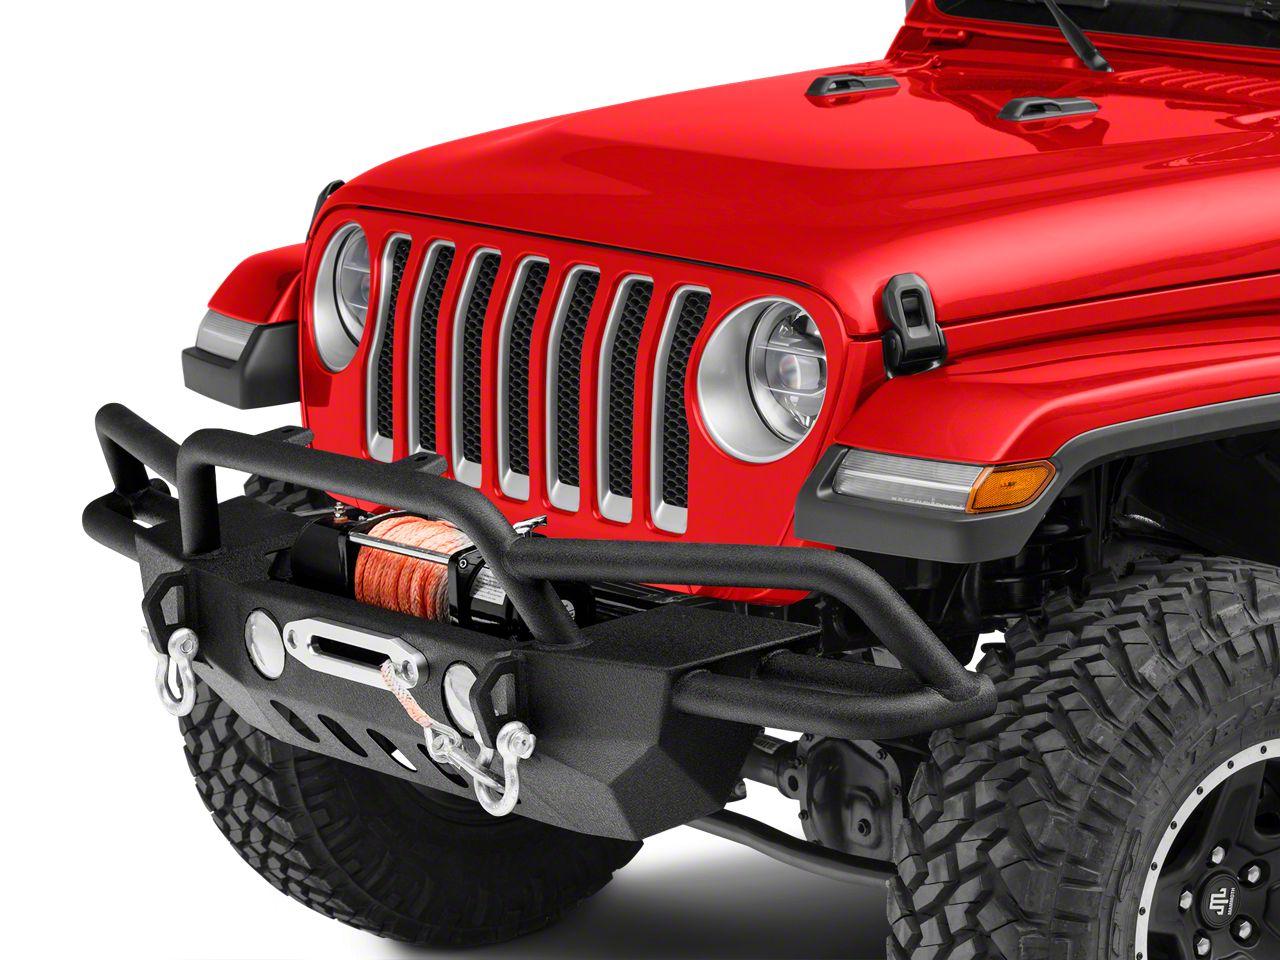 RedRock 4x4 Crawler-Max Full Width Front Bumper w/ Winch Mount (2018 Jeep Wrangler JL)